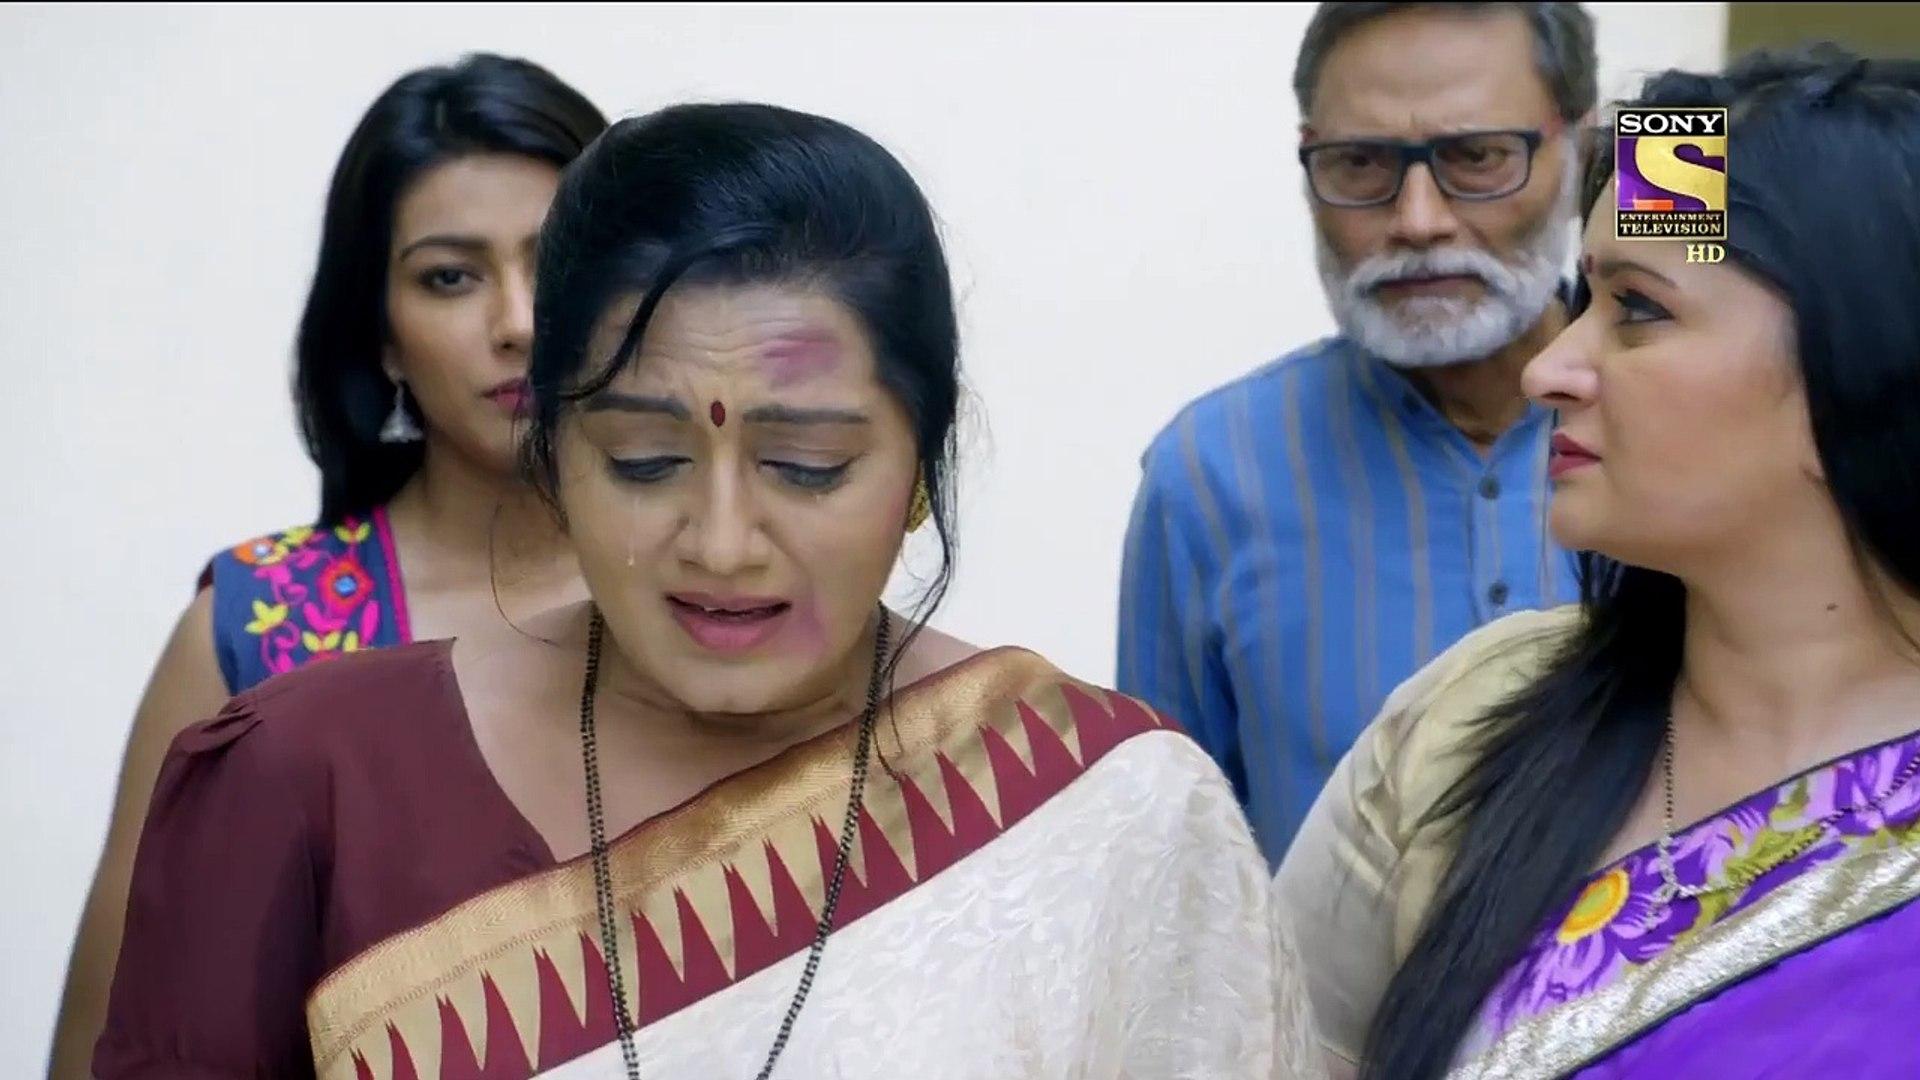 CID (Telugu) Bhootiya Lift - 20th April, 2019